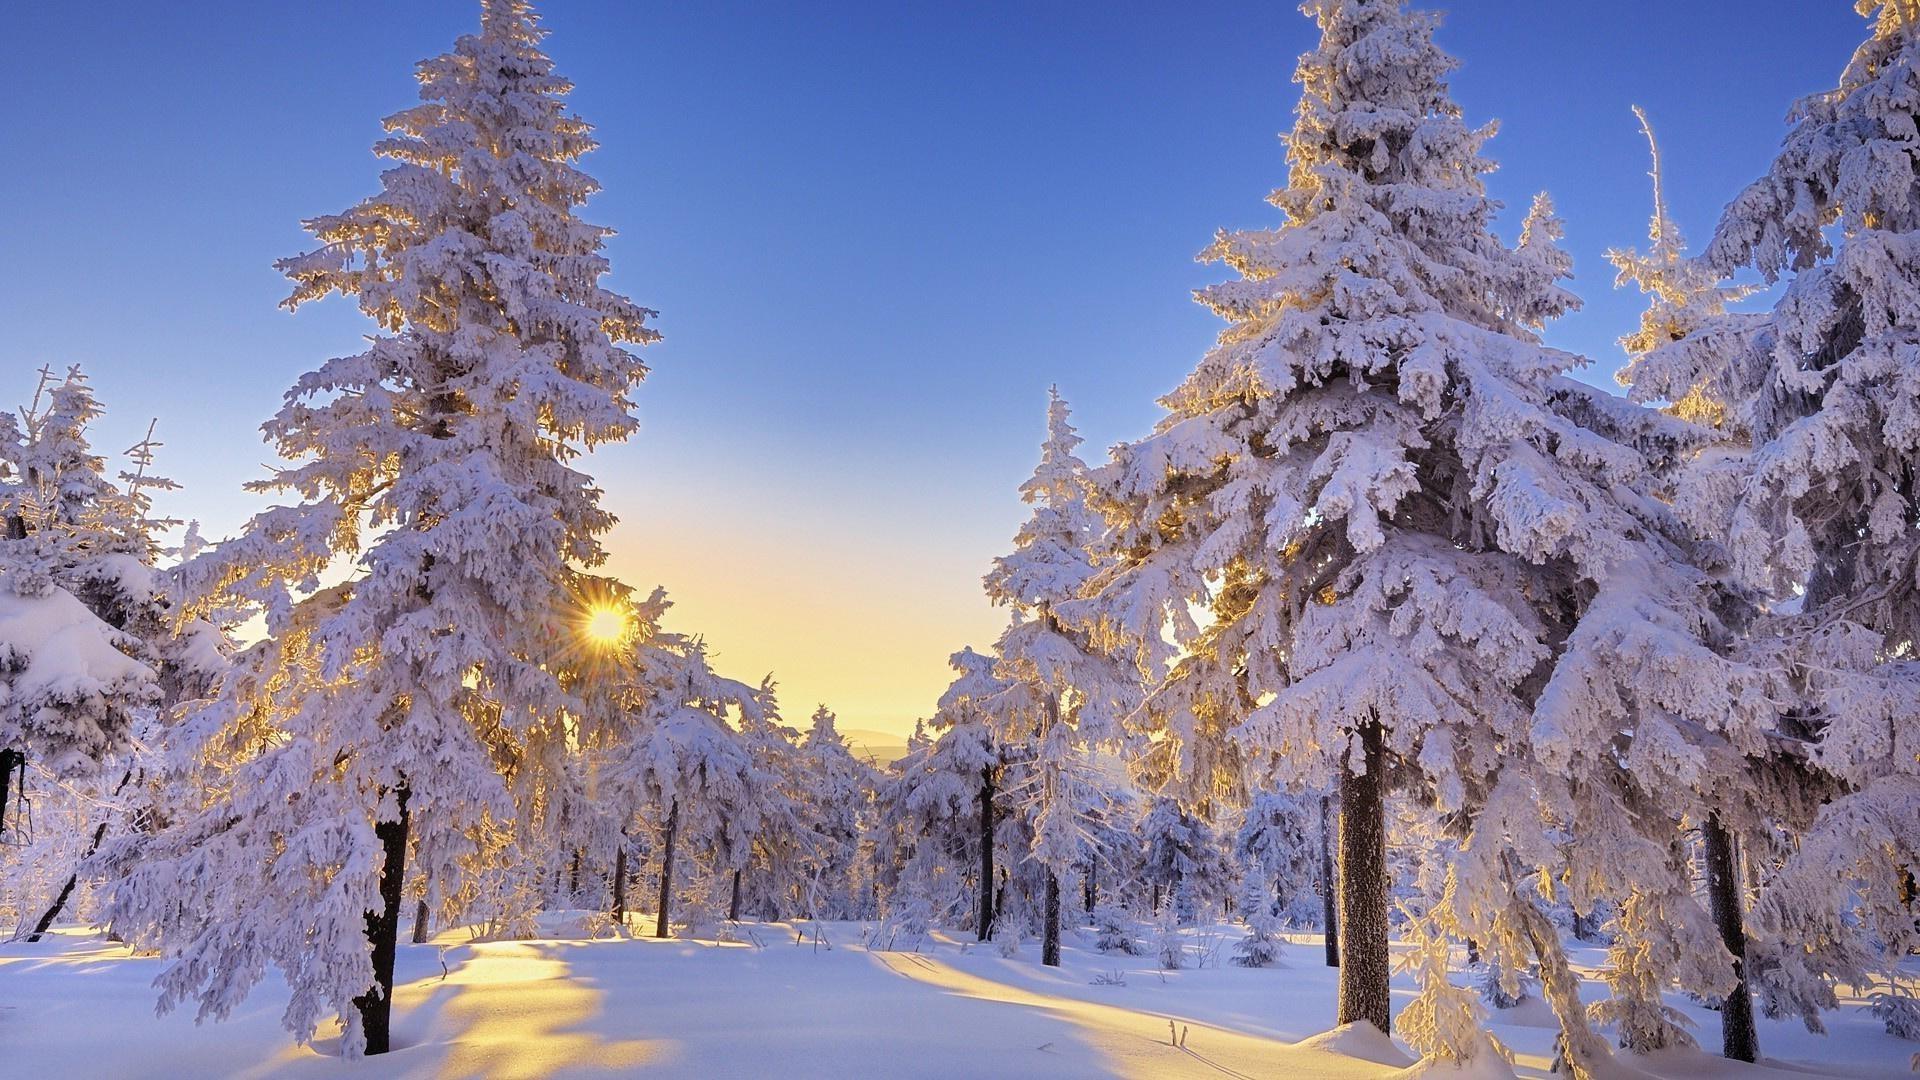 обои зима на рабочий стол пейзажи № 640862 без смс